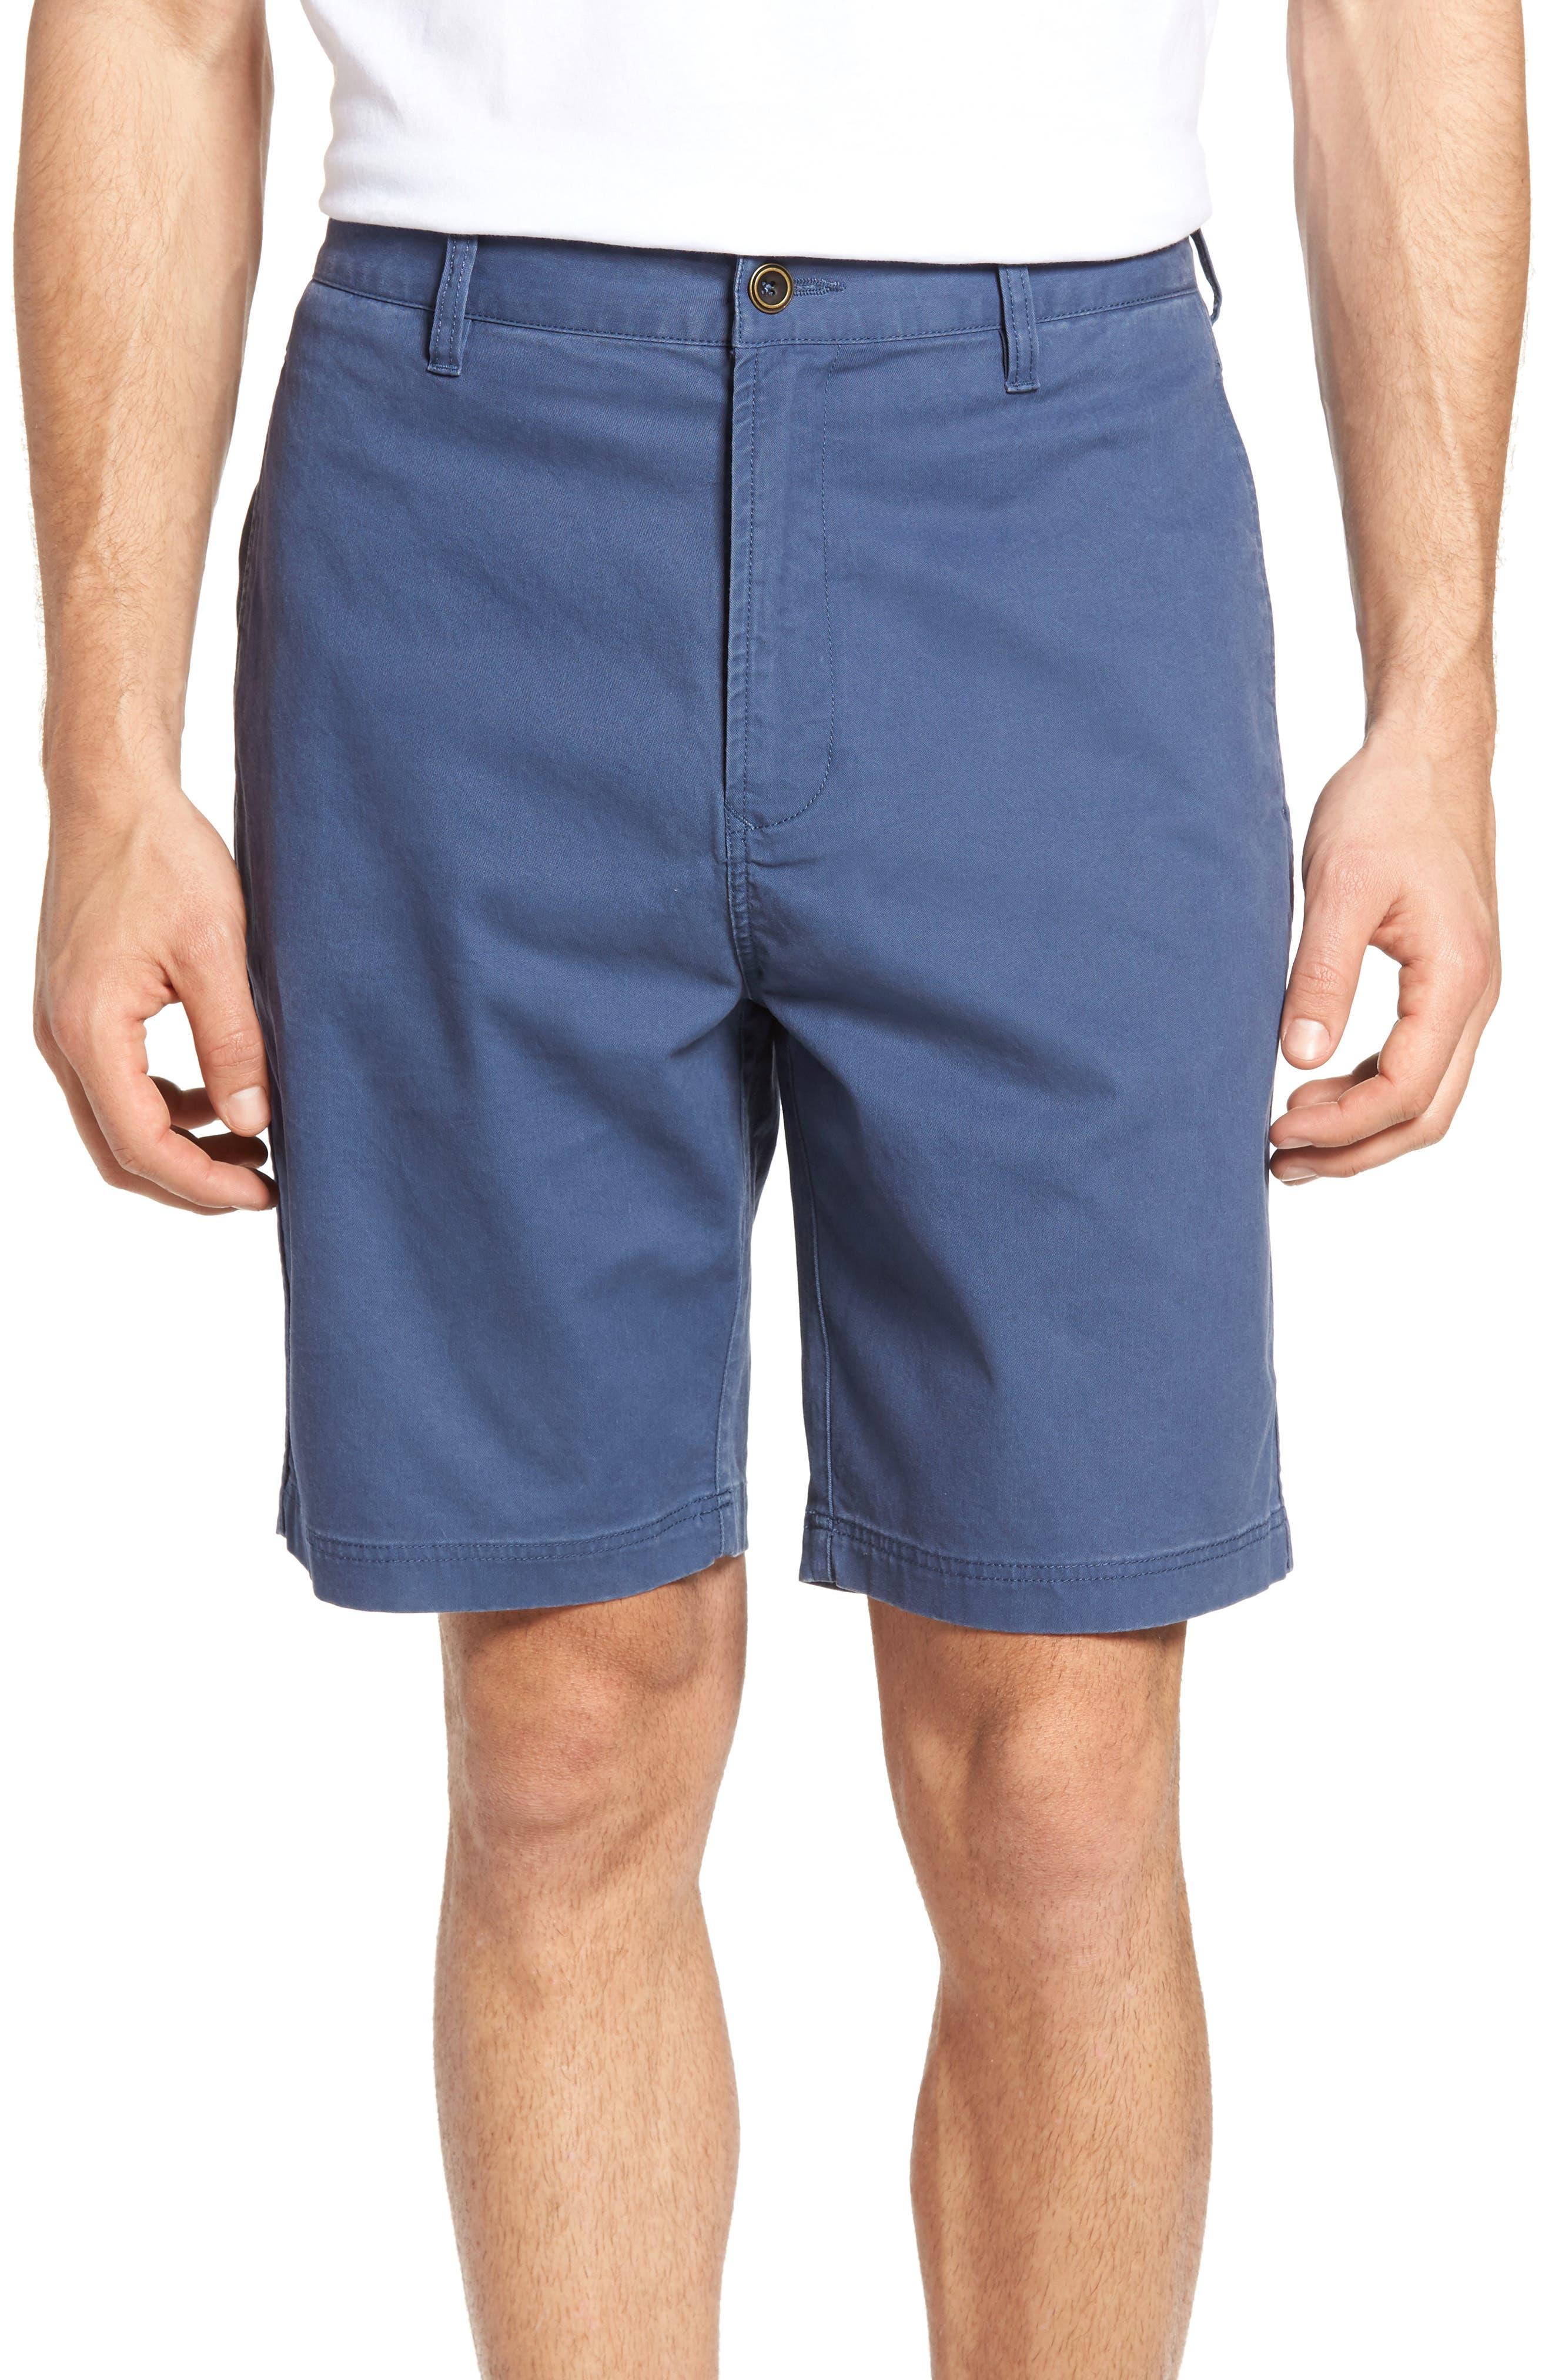 Main Image - Rodd & Gunn Glenburn Shorts